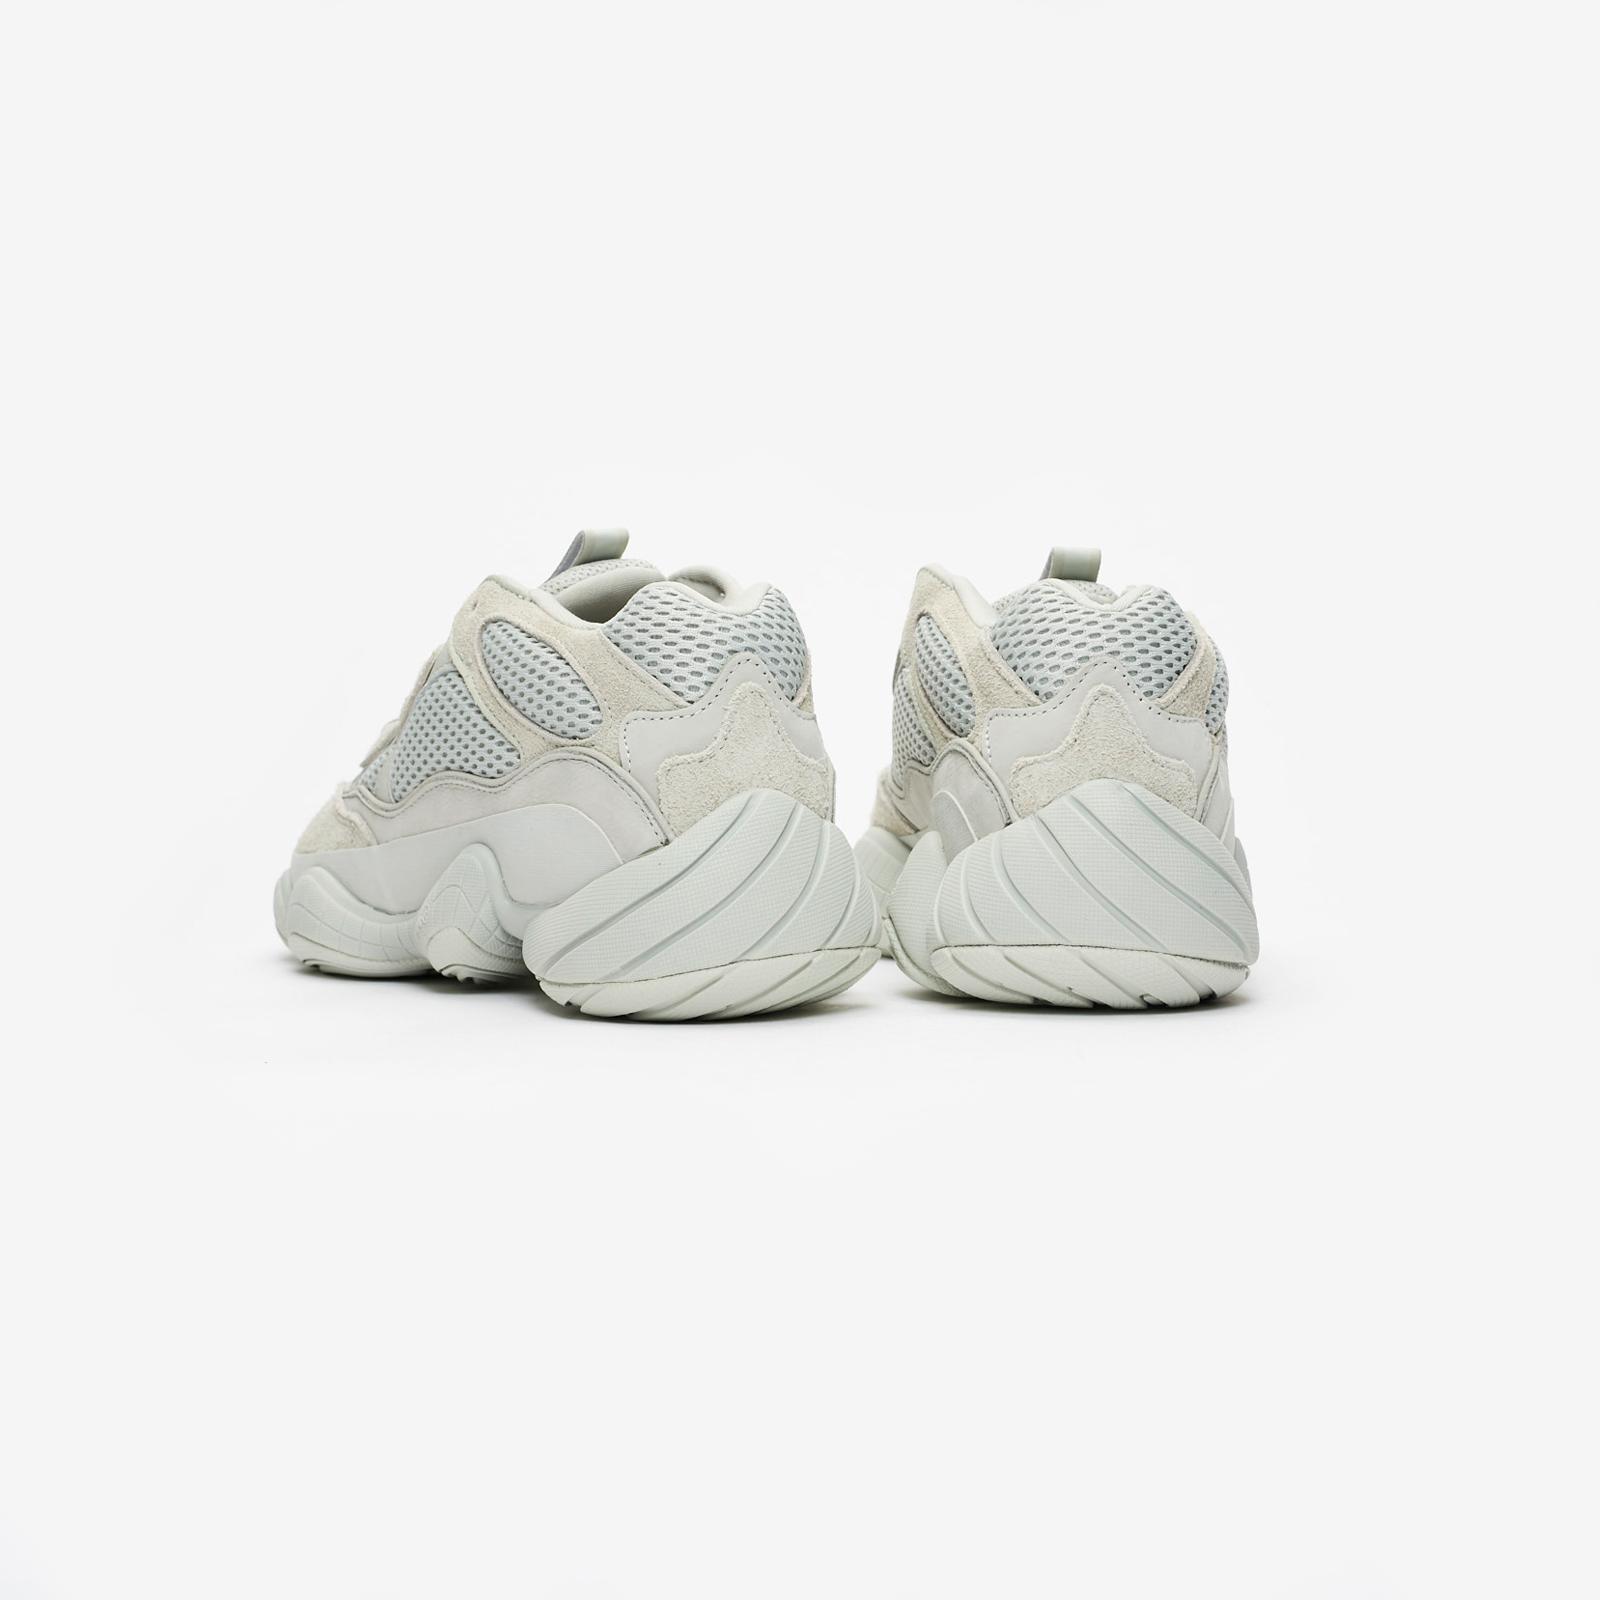 4beff86a4bb8f4 ... adidas Originals x Kanye West Yeezy 500 ...